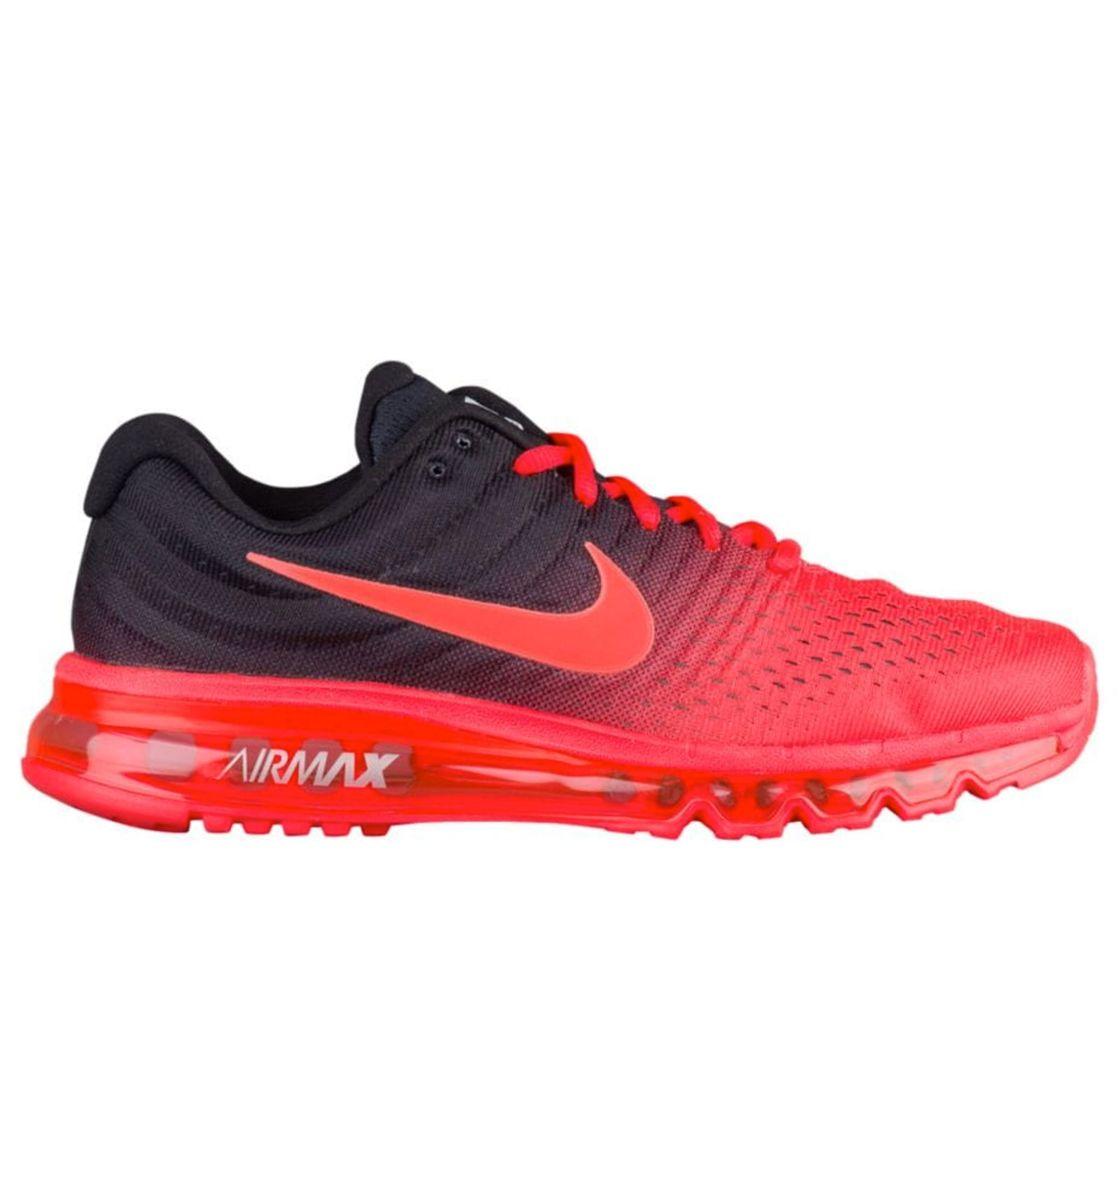 fdadf822186 nike air max 2017 vermelho e preto tênis - tênis nike